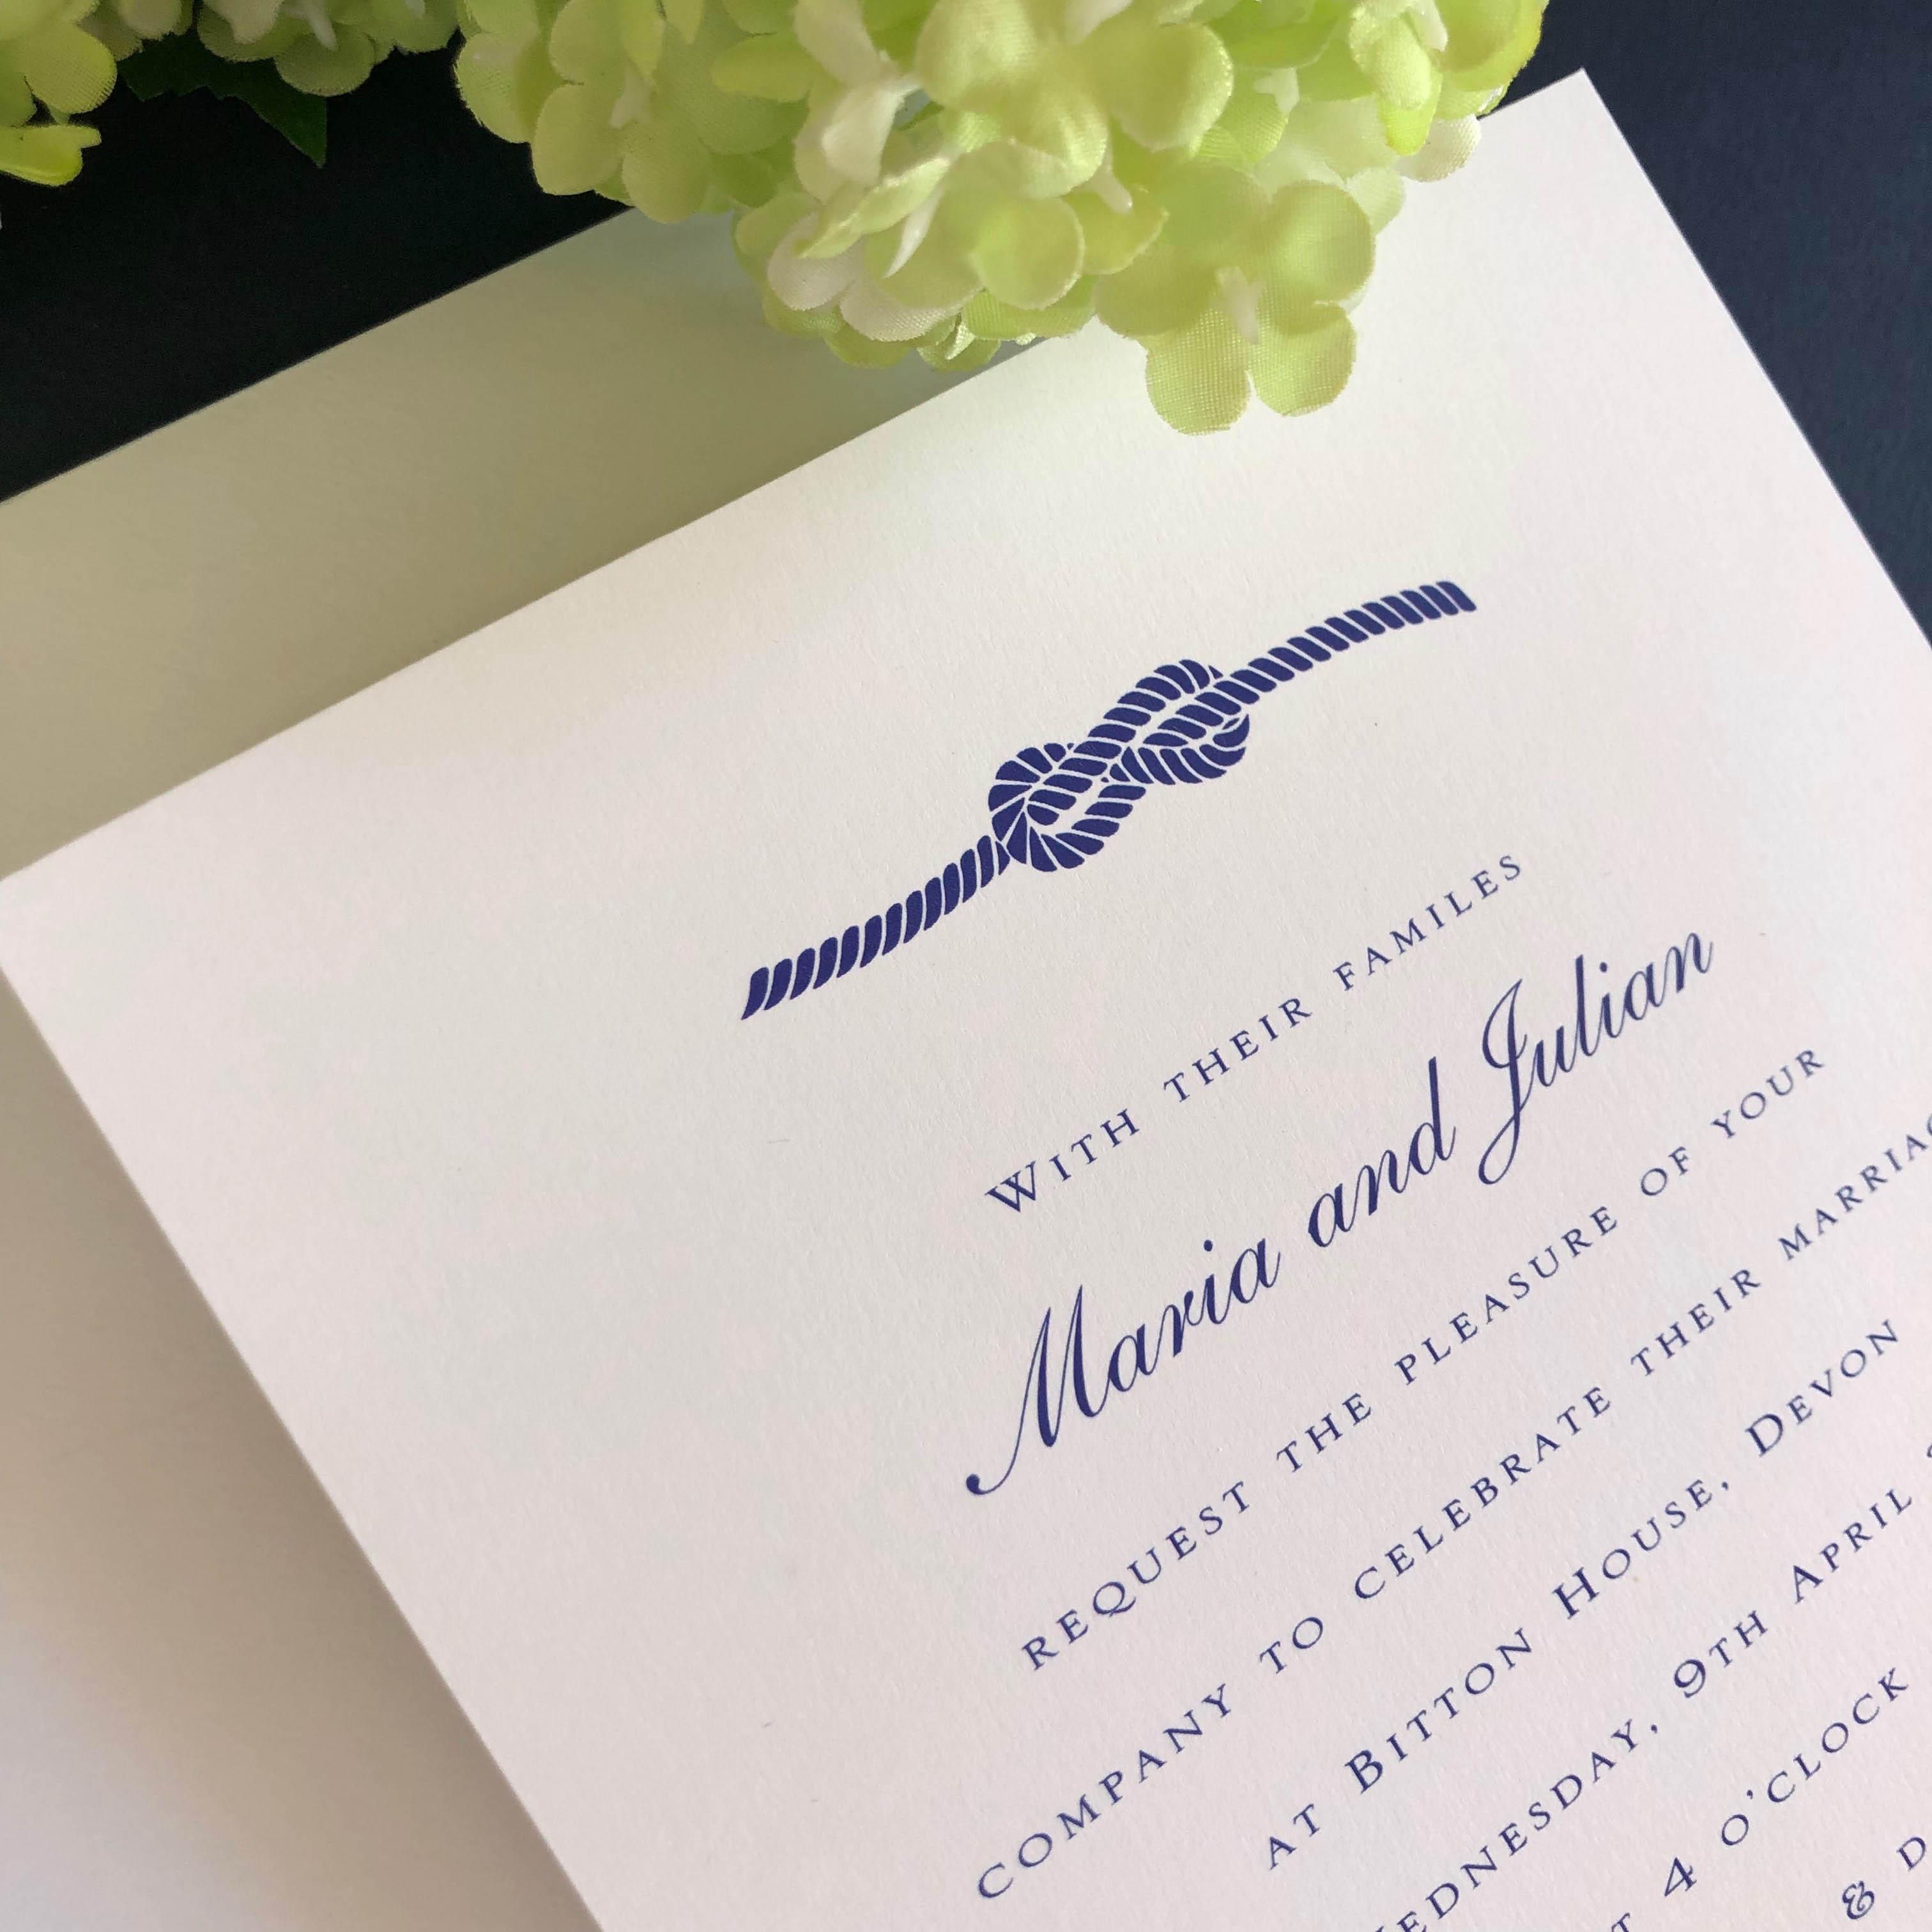 Knot wedding invitations